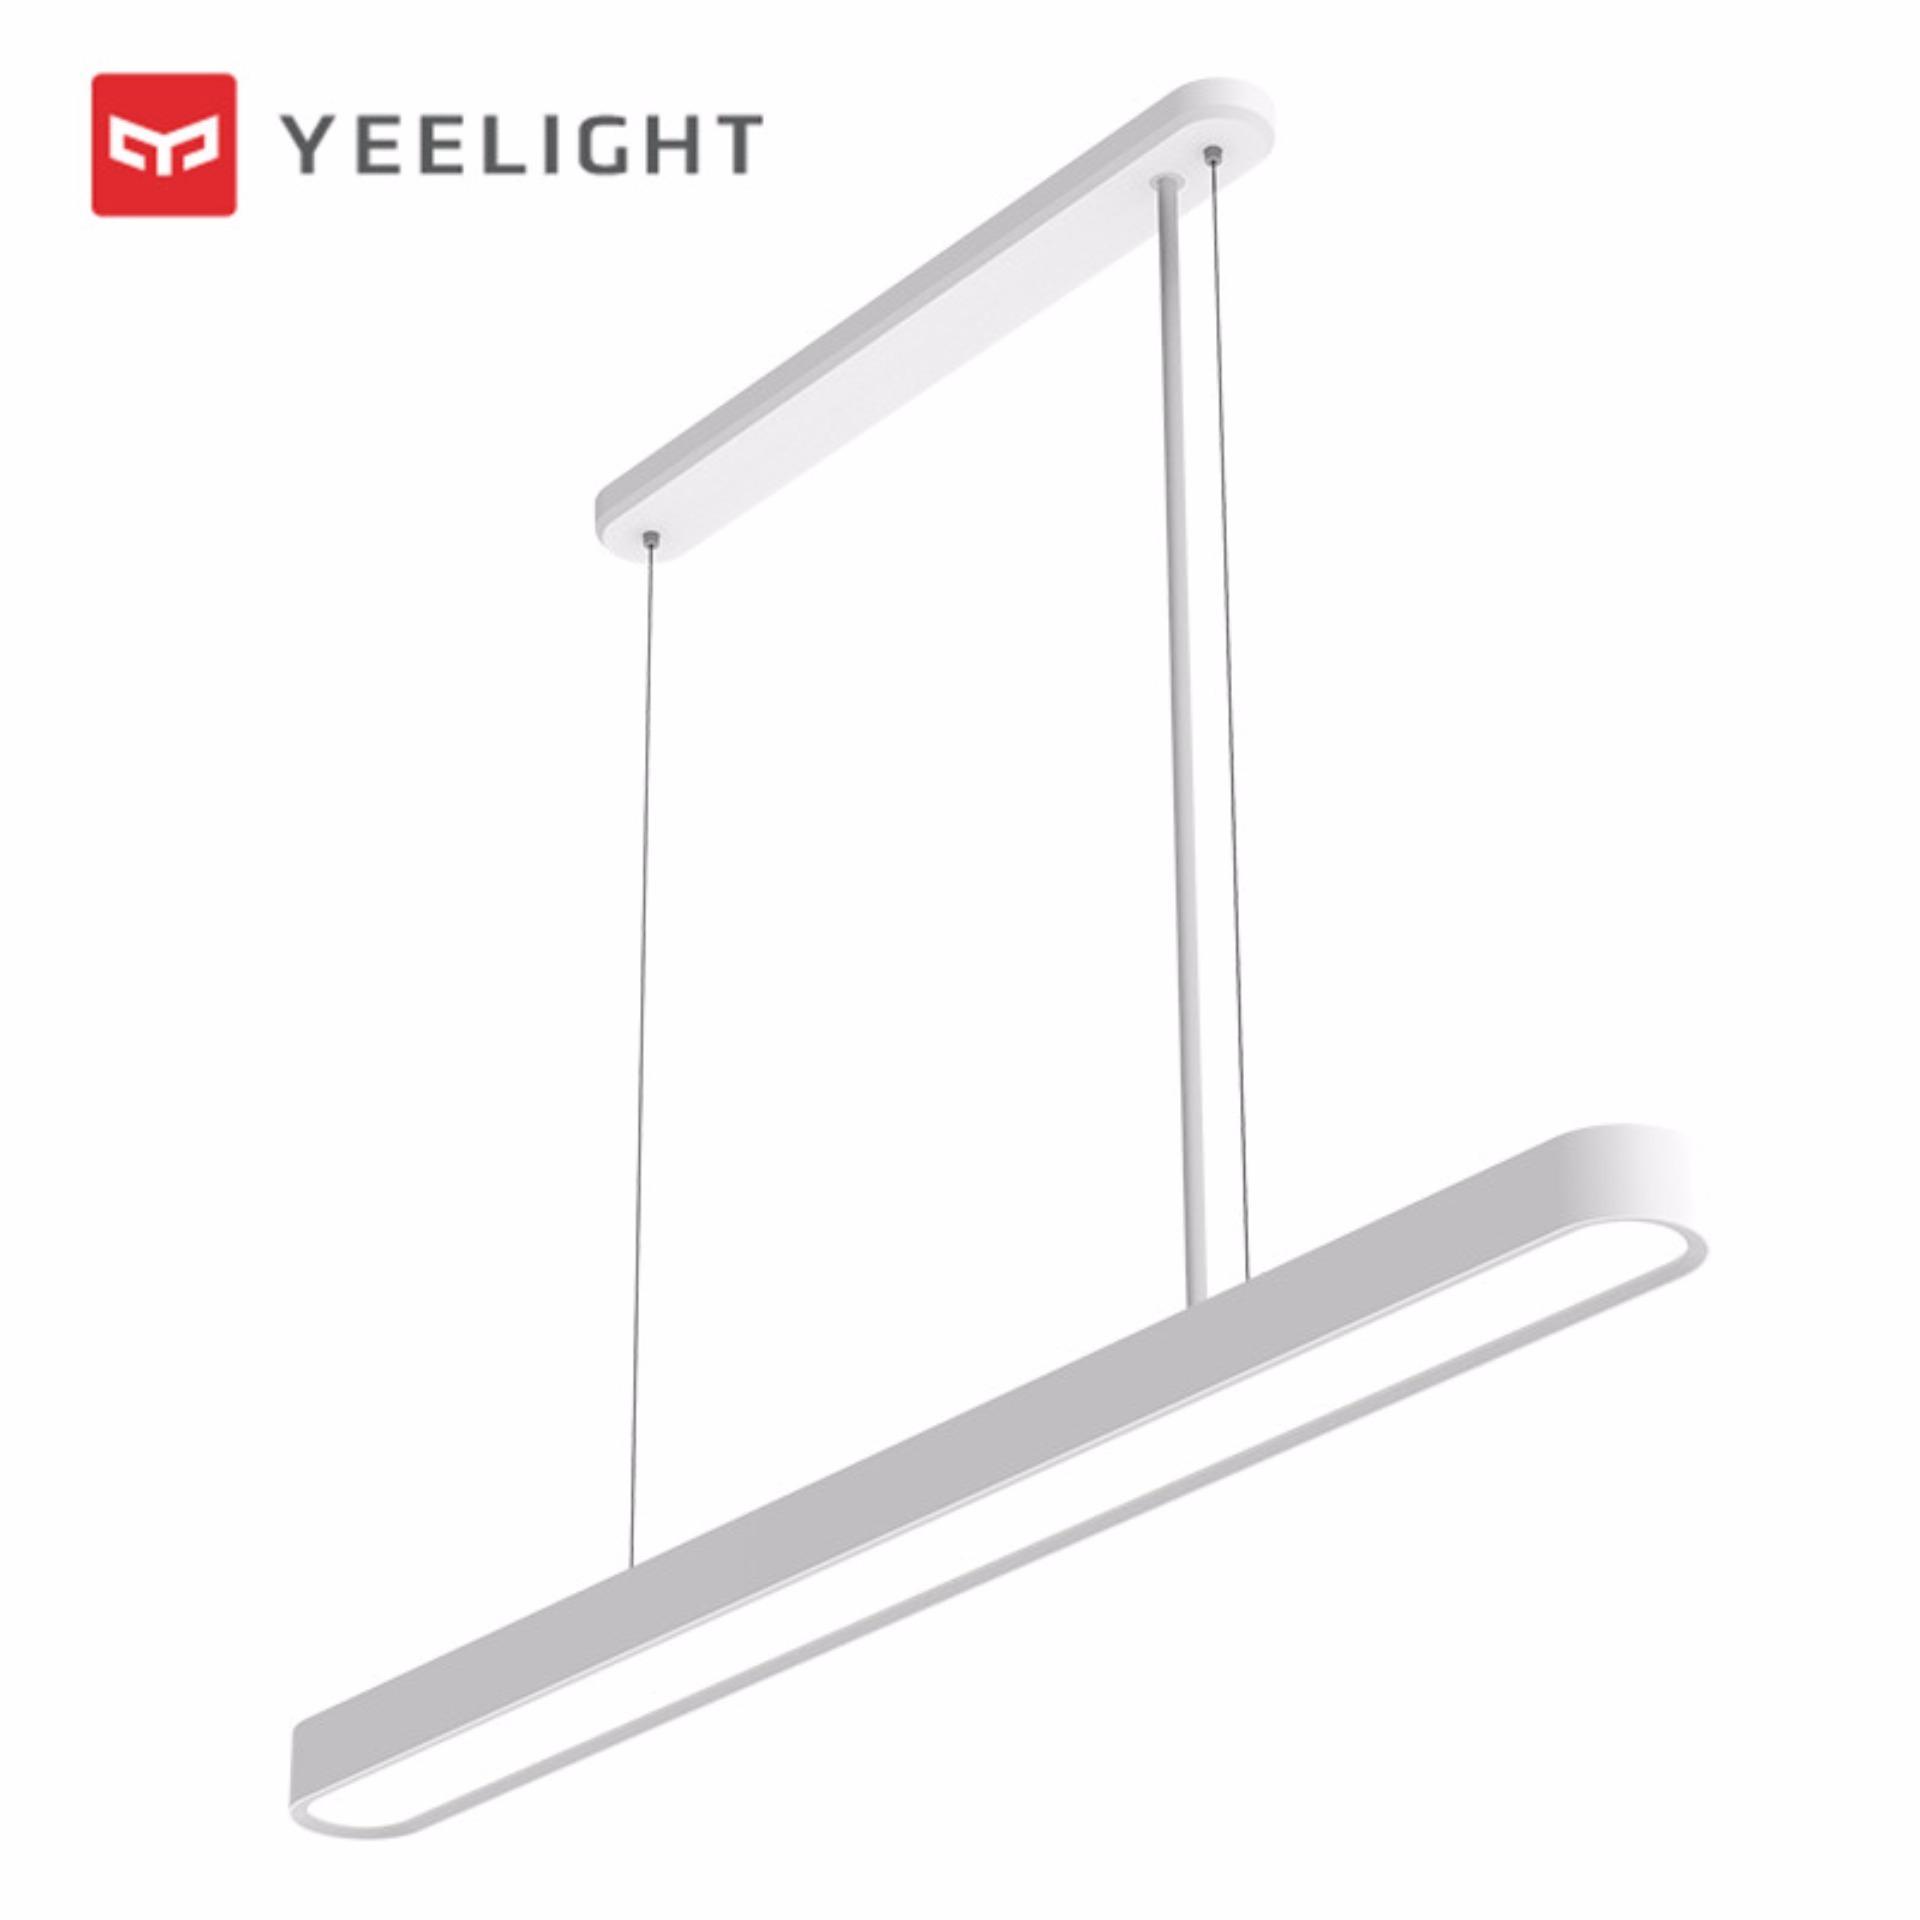 Xiaomi Yeelight Meteorite LED Smart Dinner Pendant Lights ( Xiaomi Ecosystem Product )